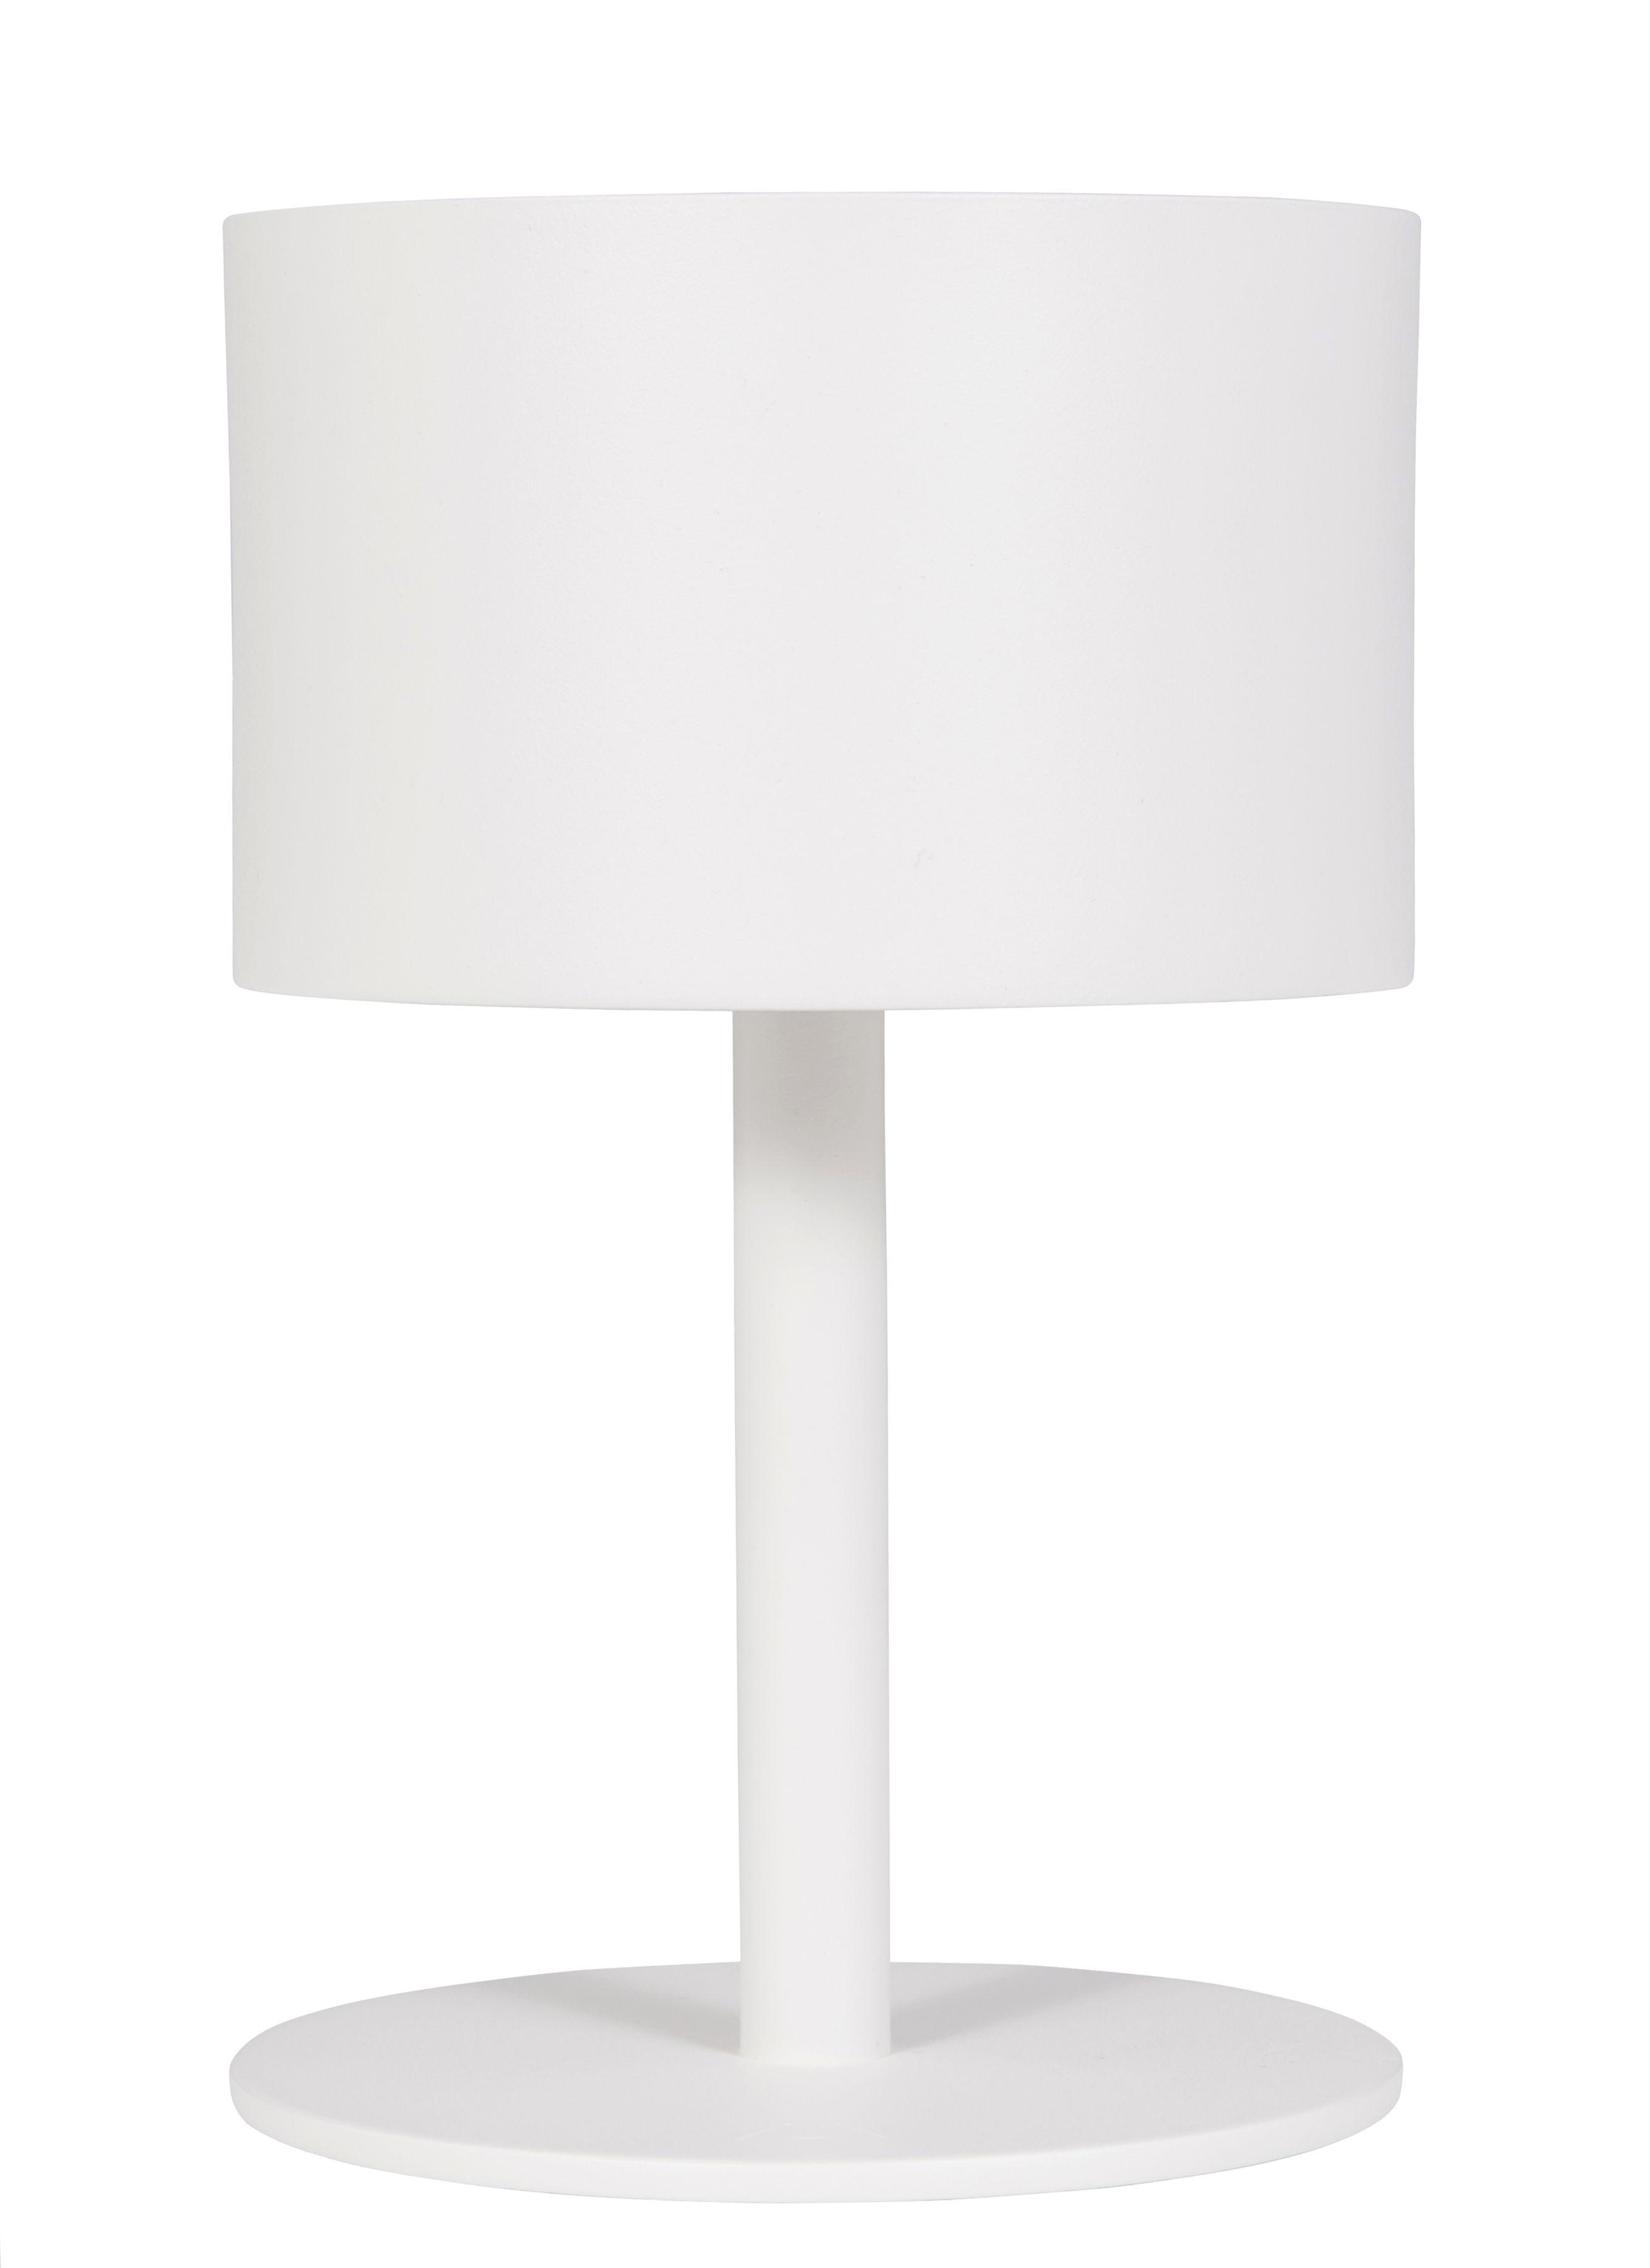 Leuchten - Tischleuchten - La Lampe Pose 01 Solarlampe / LED - kabellos - Maiori - Weiß - Aluminium